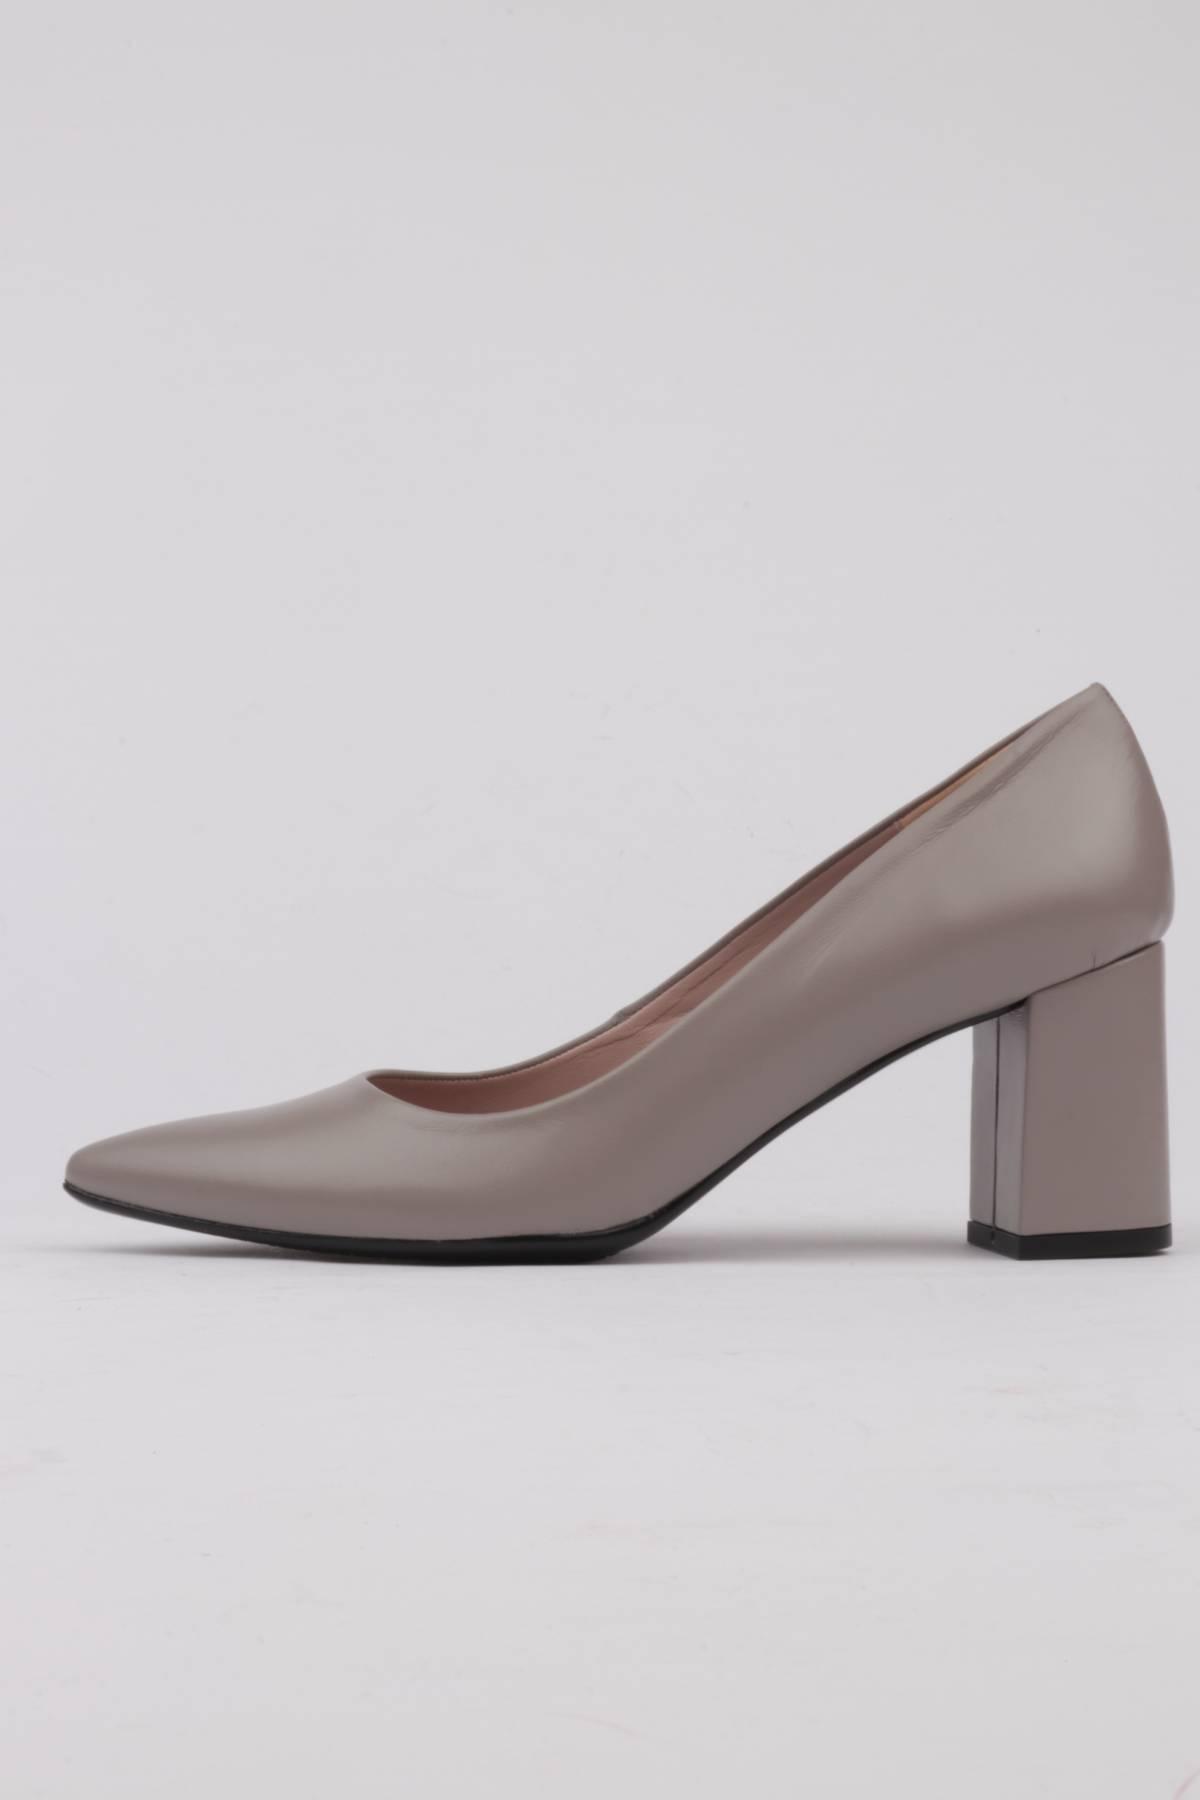 Stiletto wide heel light grey skin